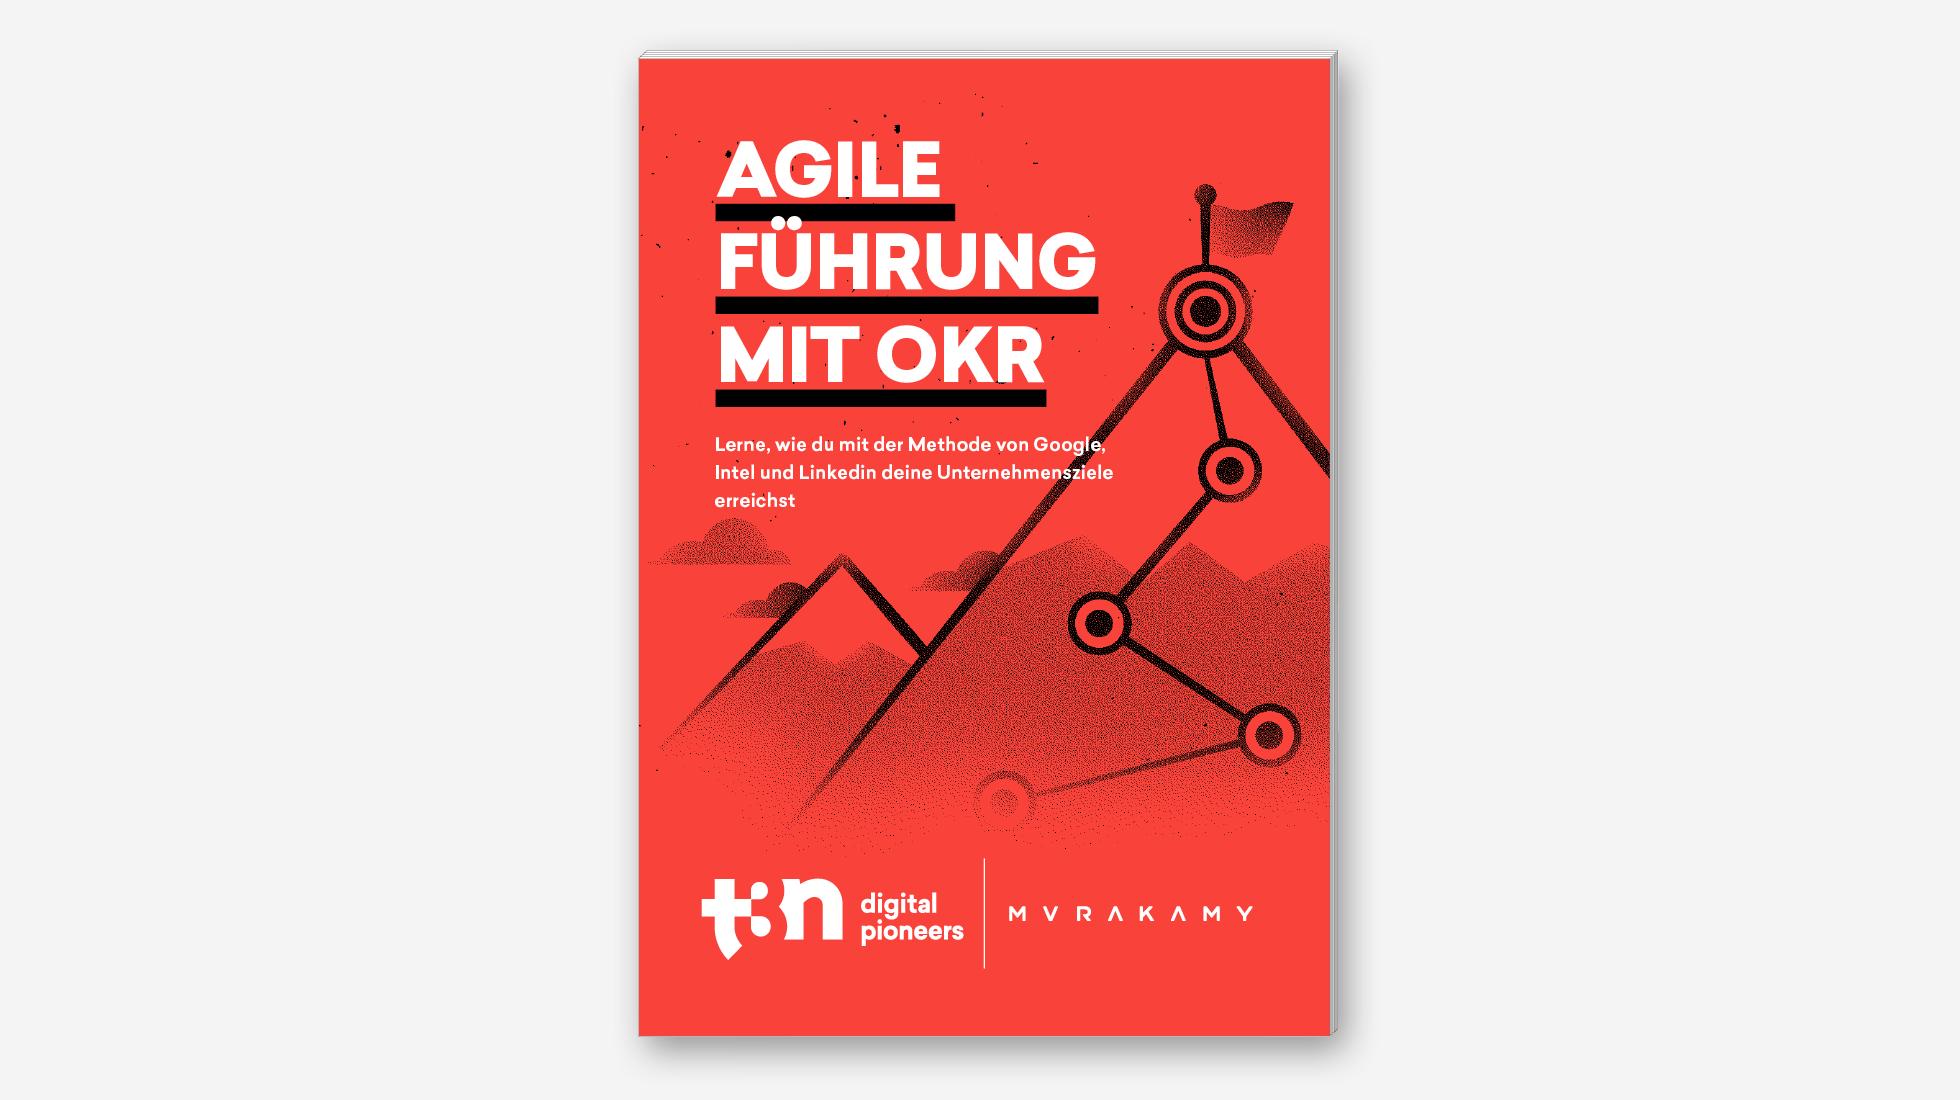 OKR-Guide 2019 | by t3n X Murakamy